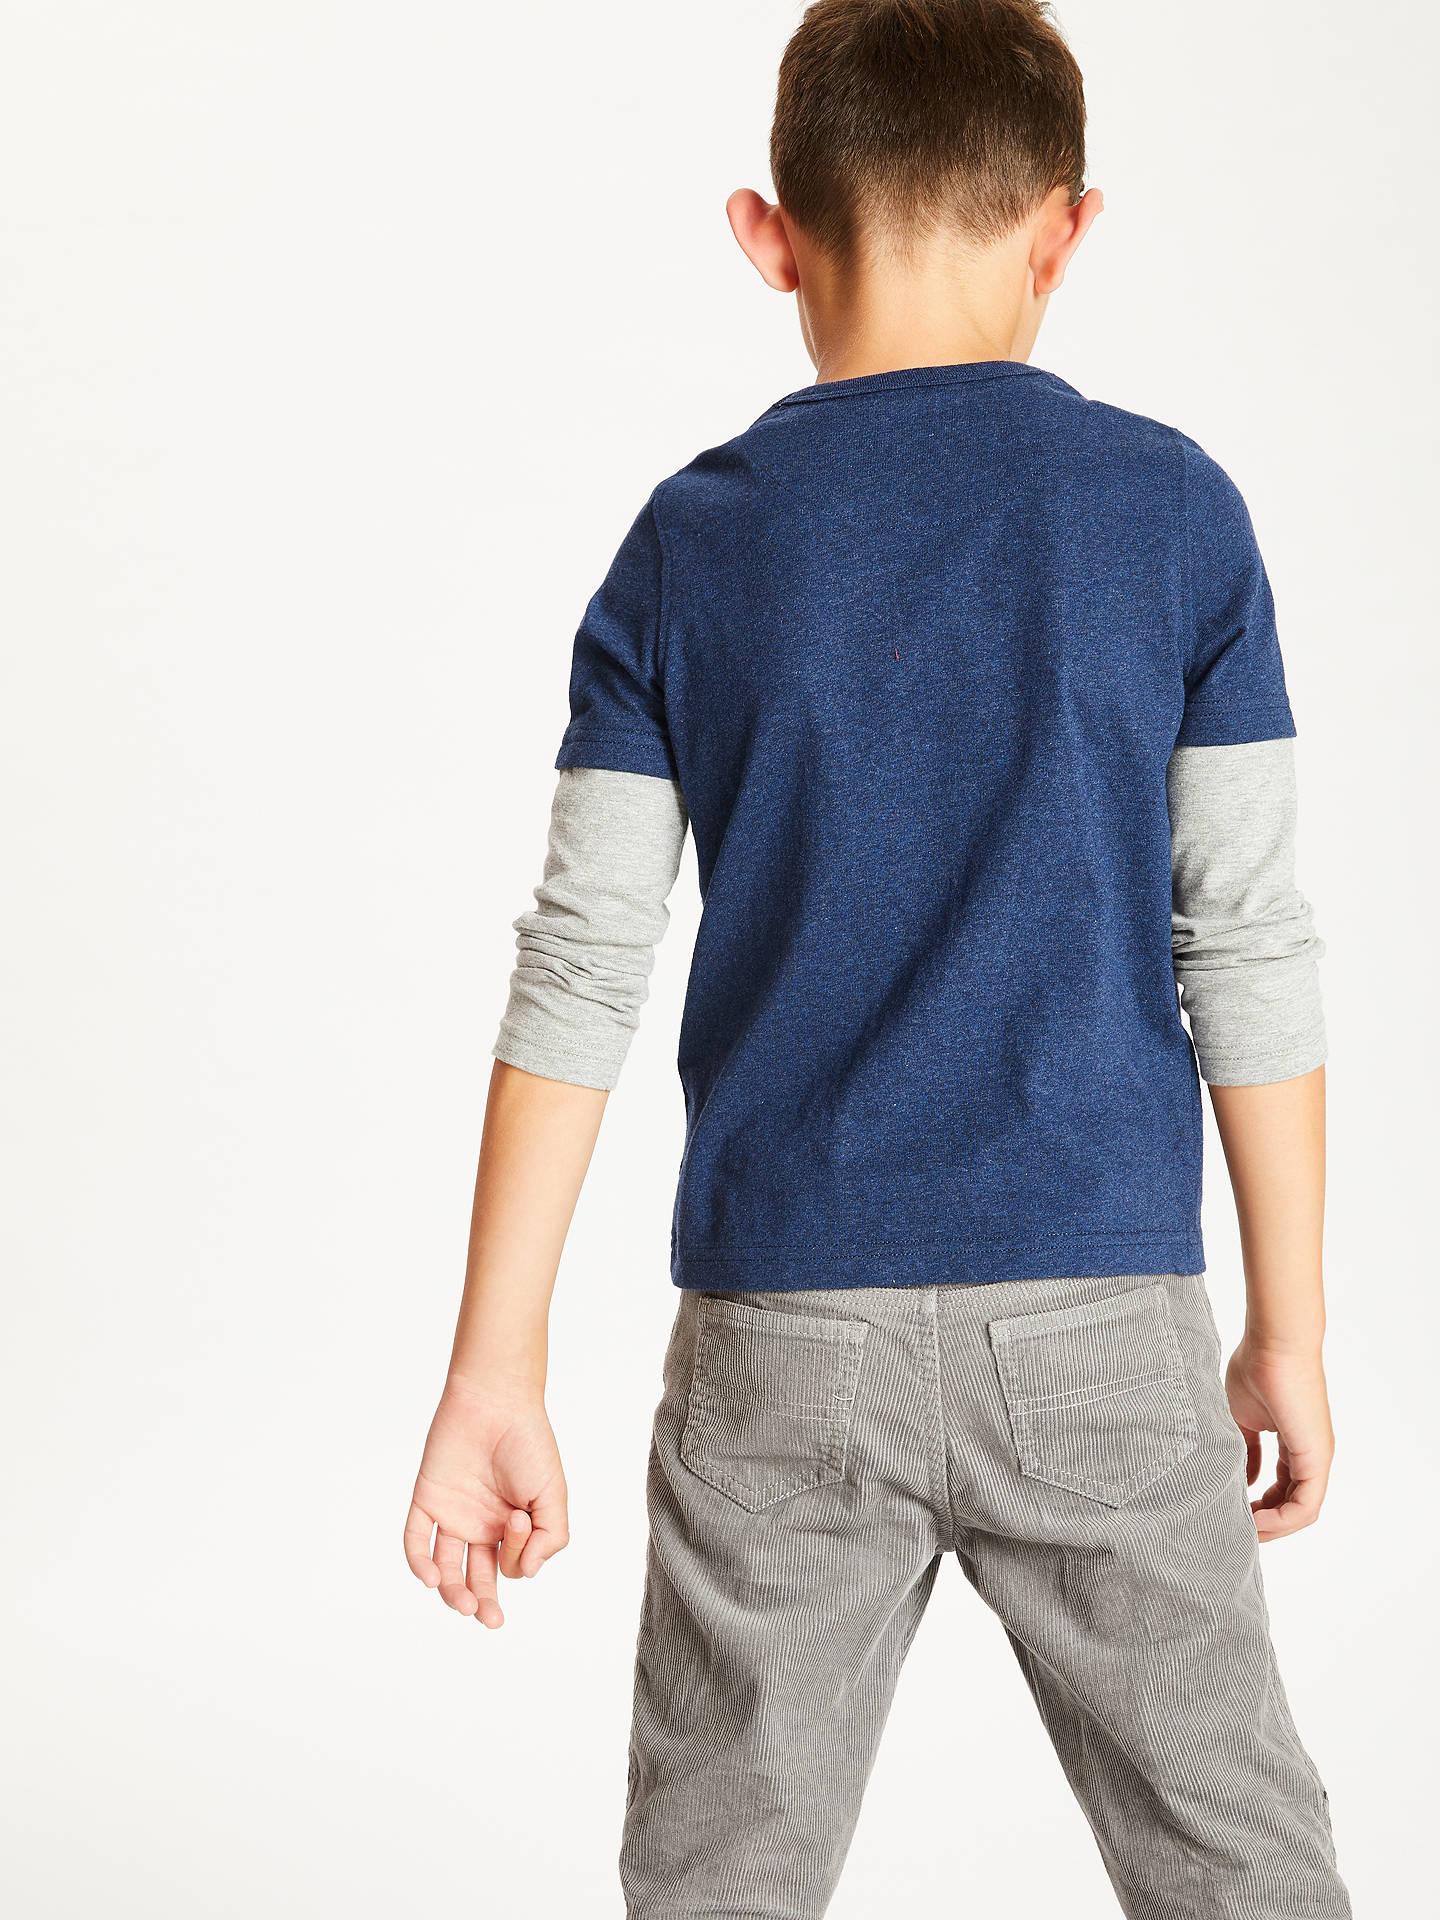 88b7cdd6 ... Buy John Lewis & Partners Boys' Dinosaur Glow In The Dark T-Shirt, ...